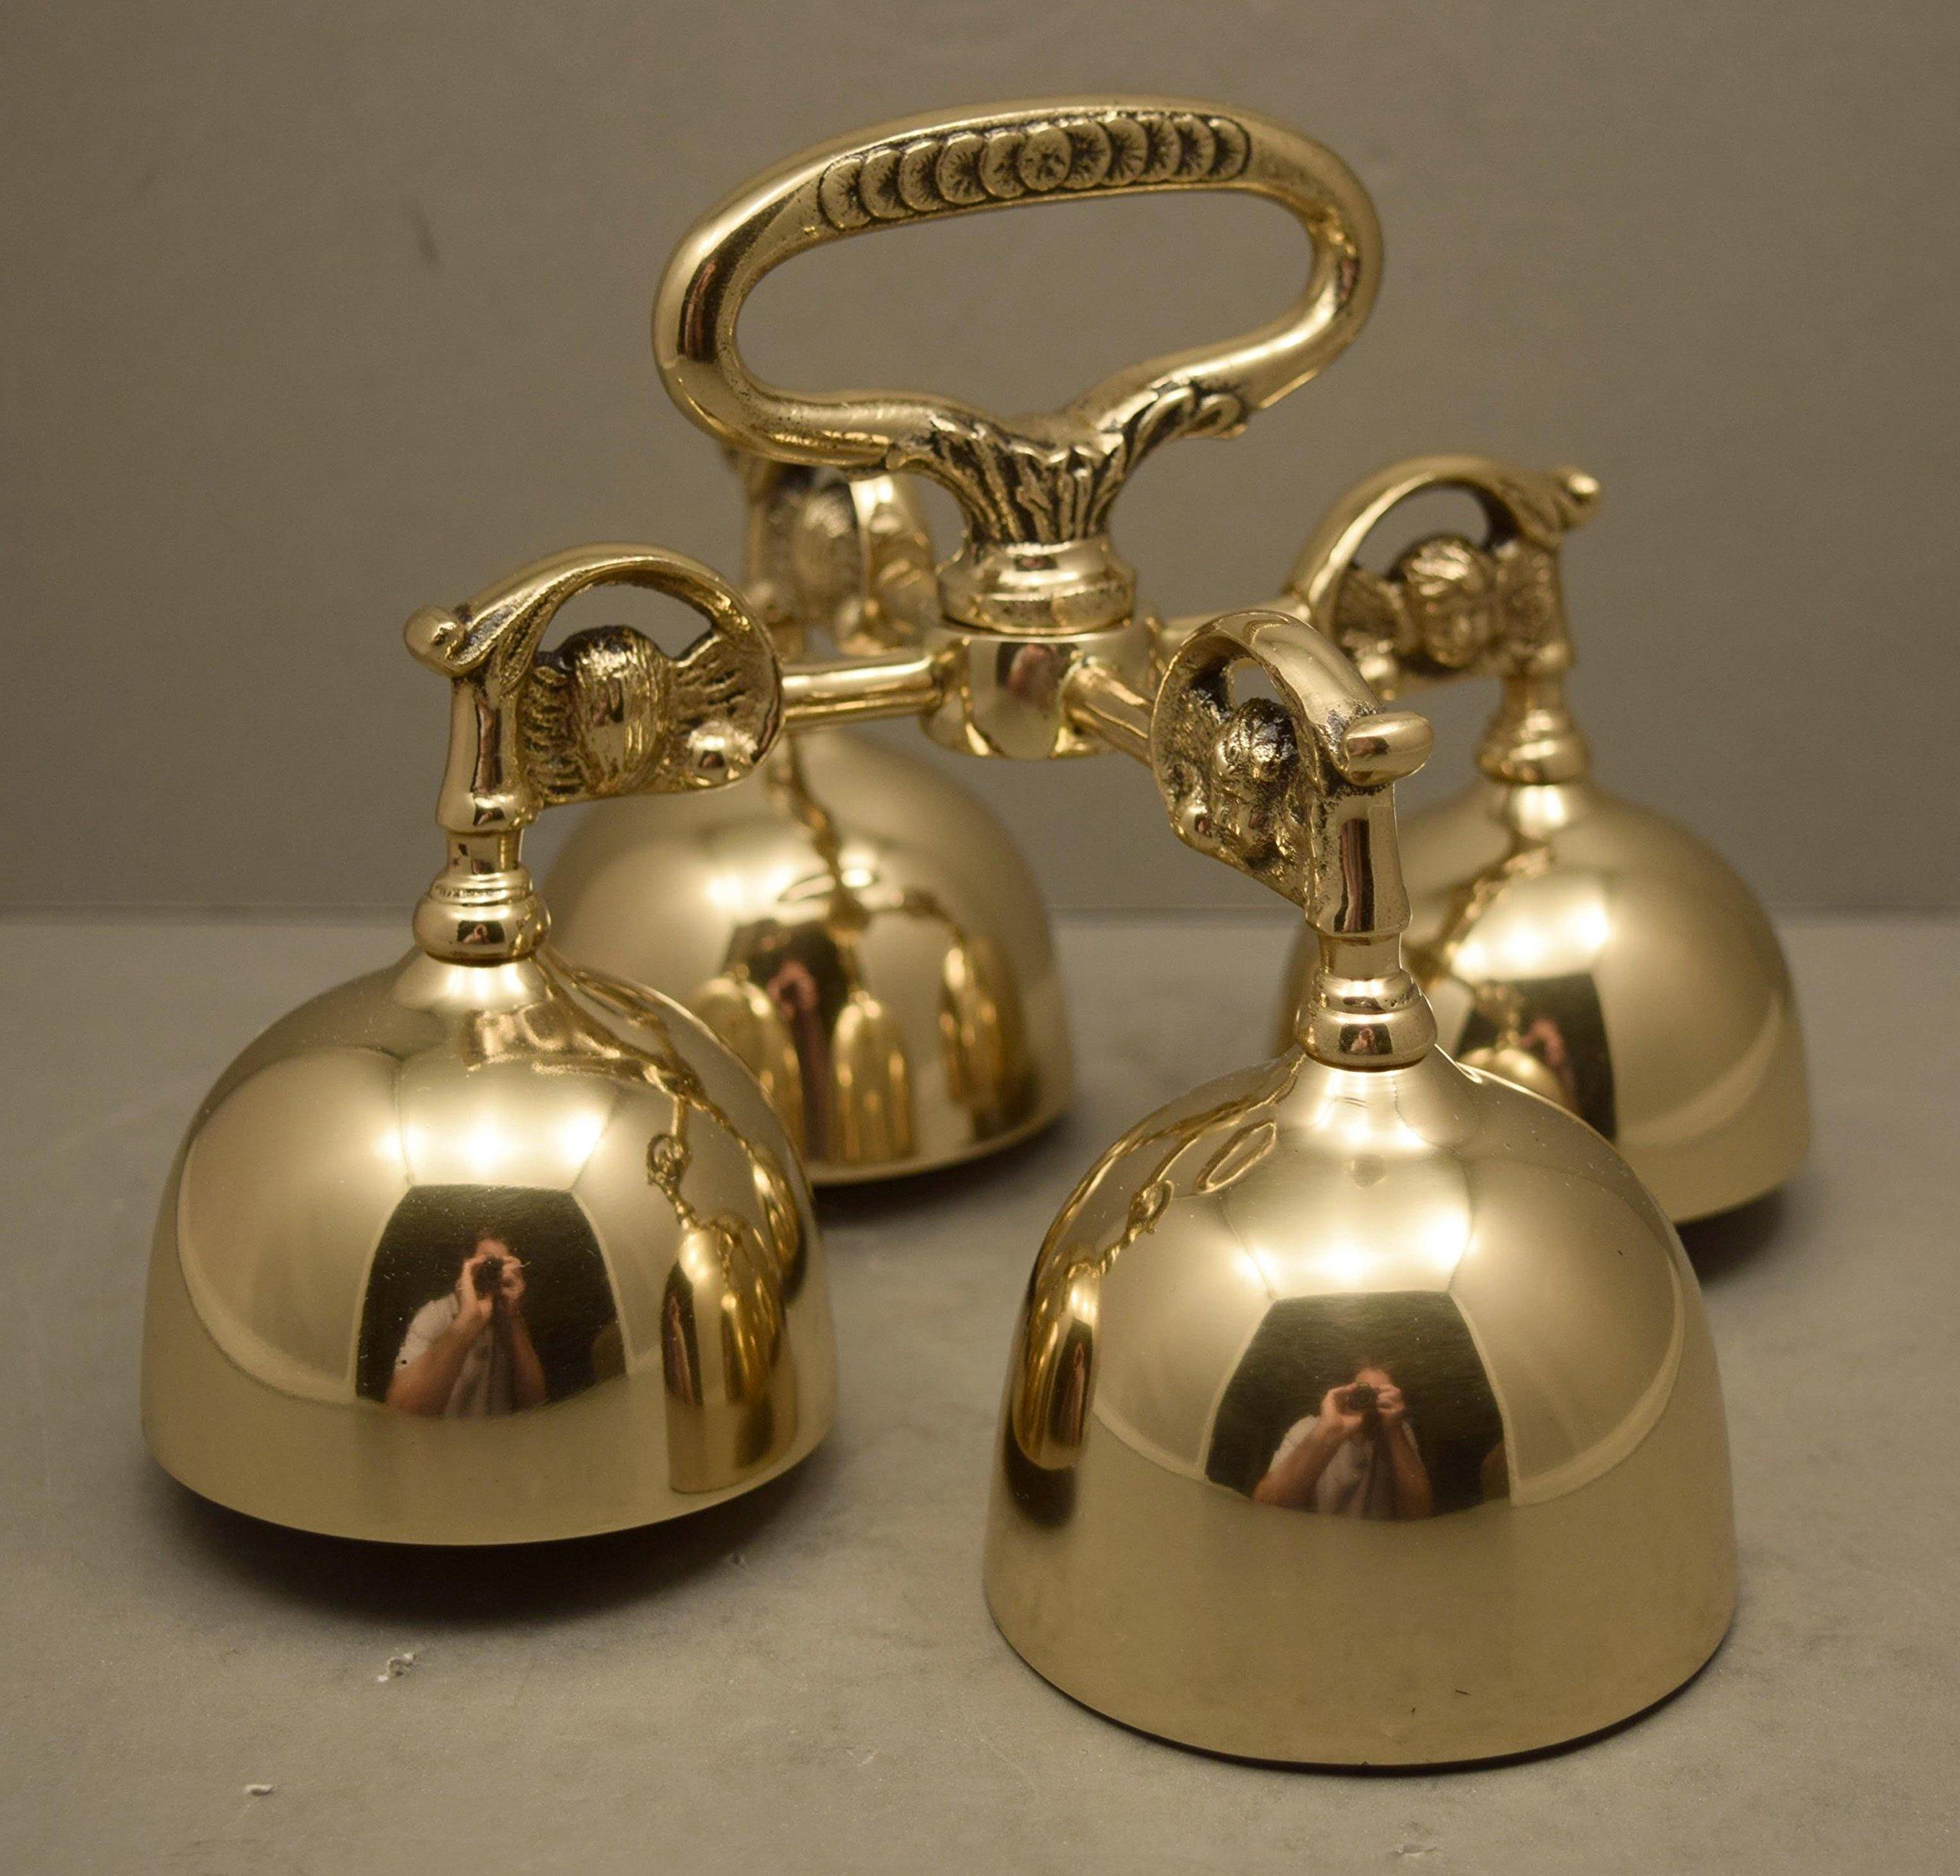 The Best Sounding Bronze Church Communion Bells, Sanctus Bells (CCG-390)